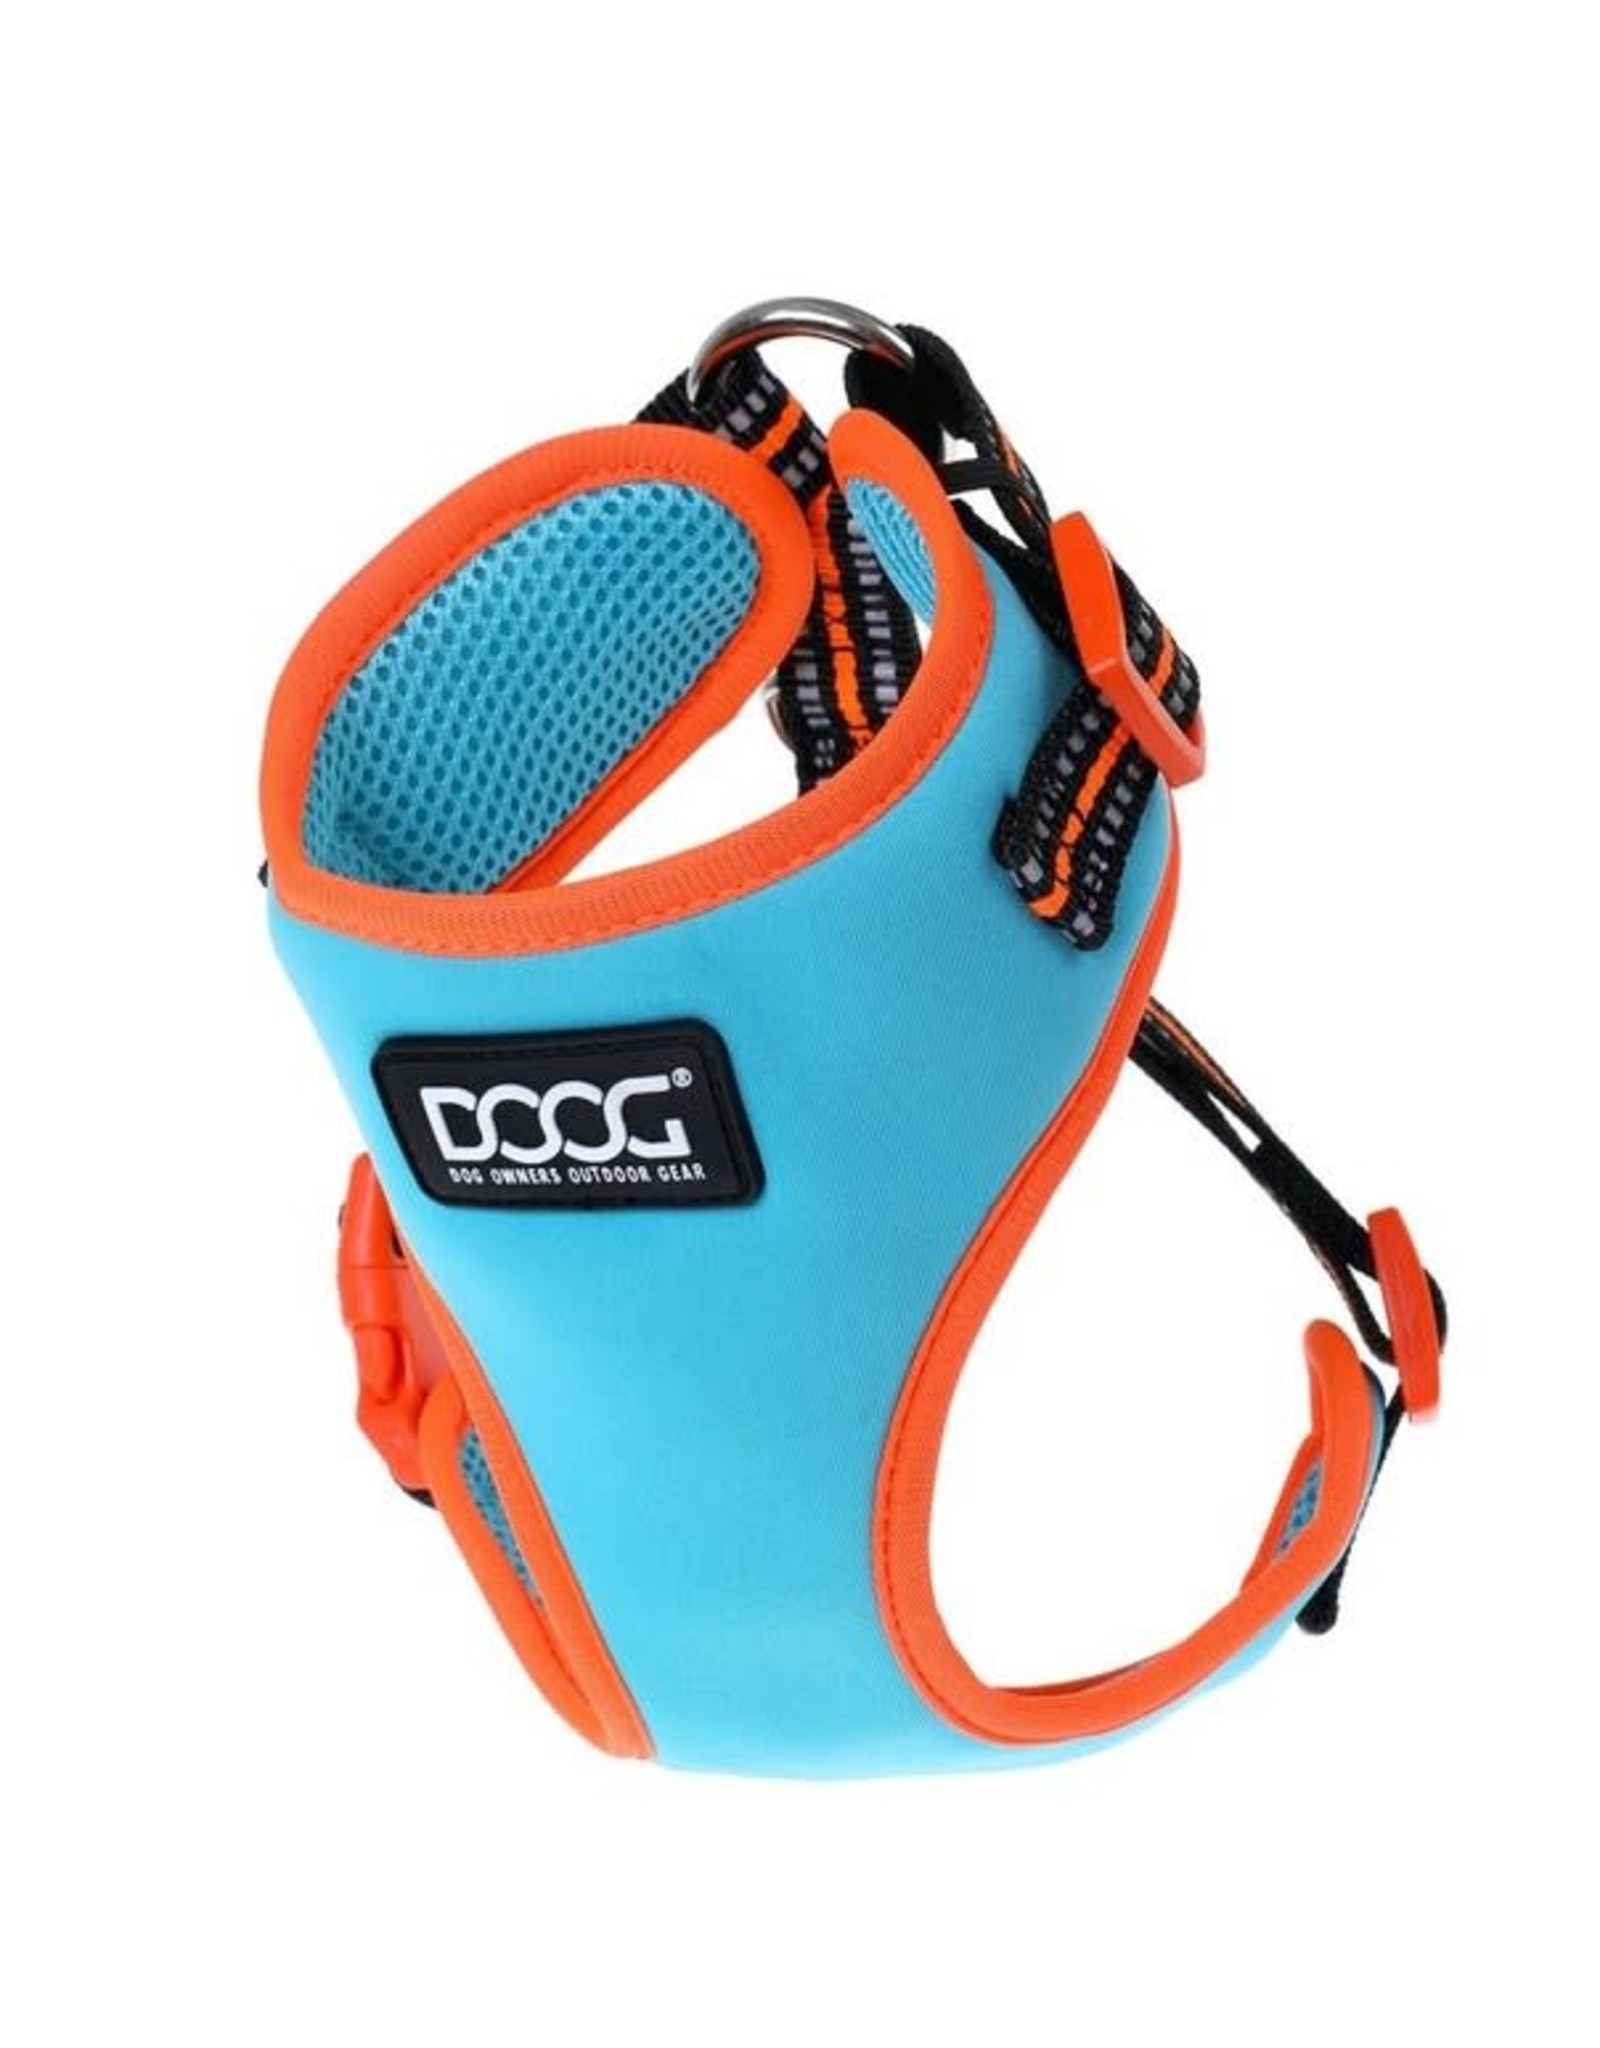 DOOG Neoflex Dog Harness